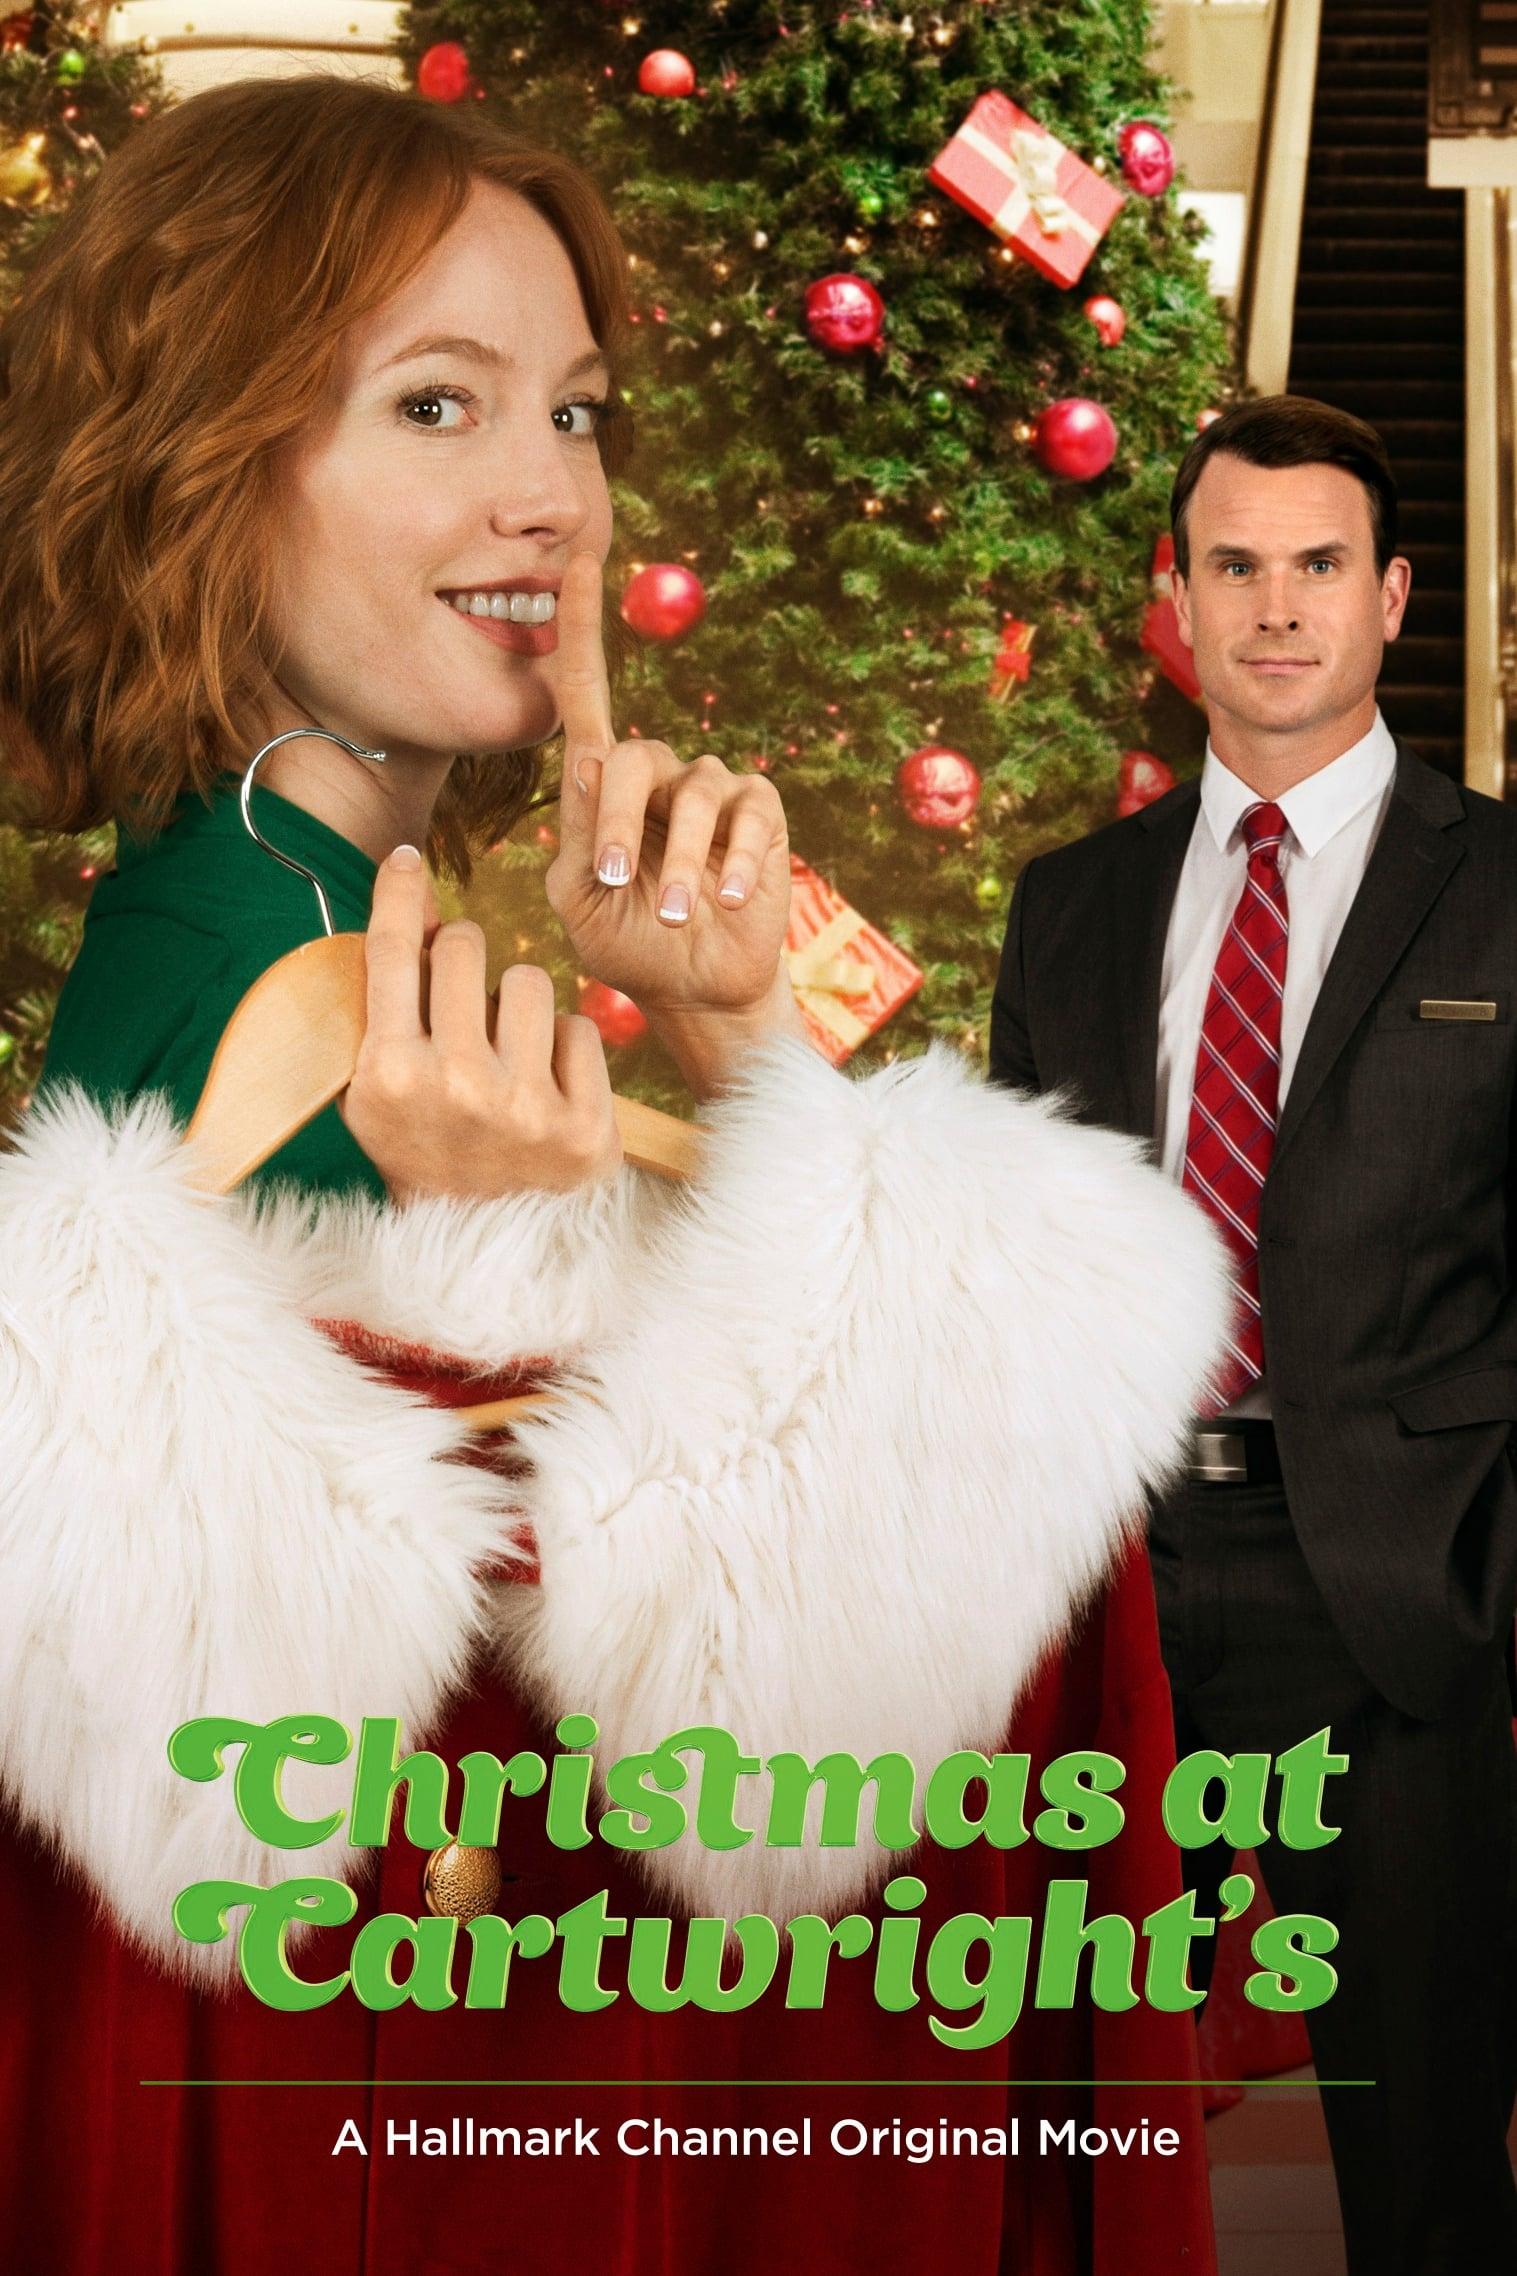 Christmas at Cartwright's (2014)